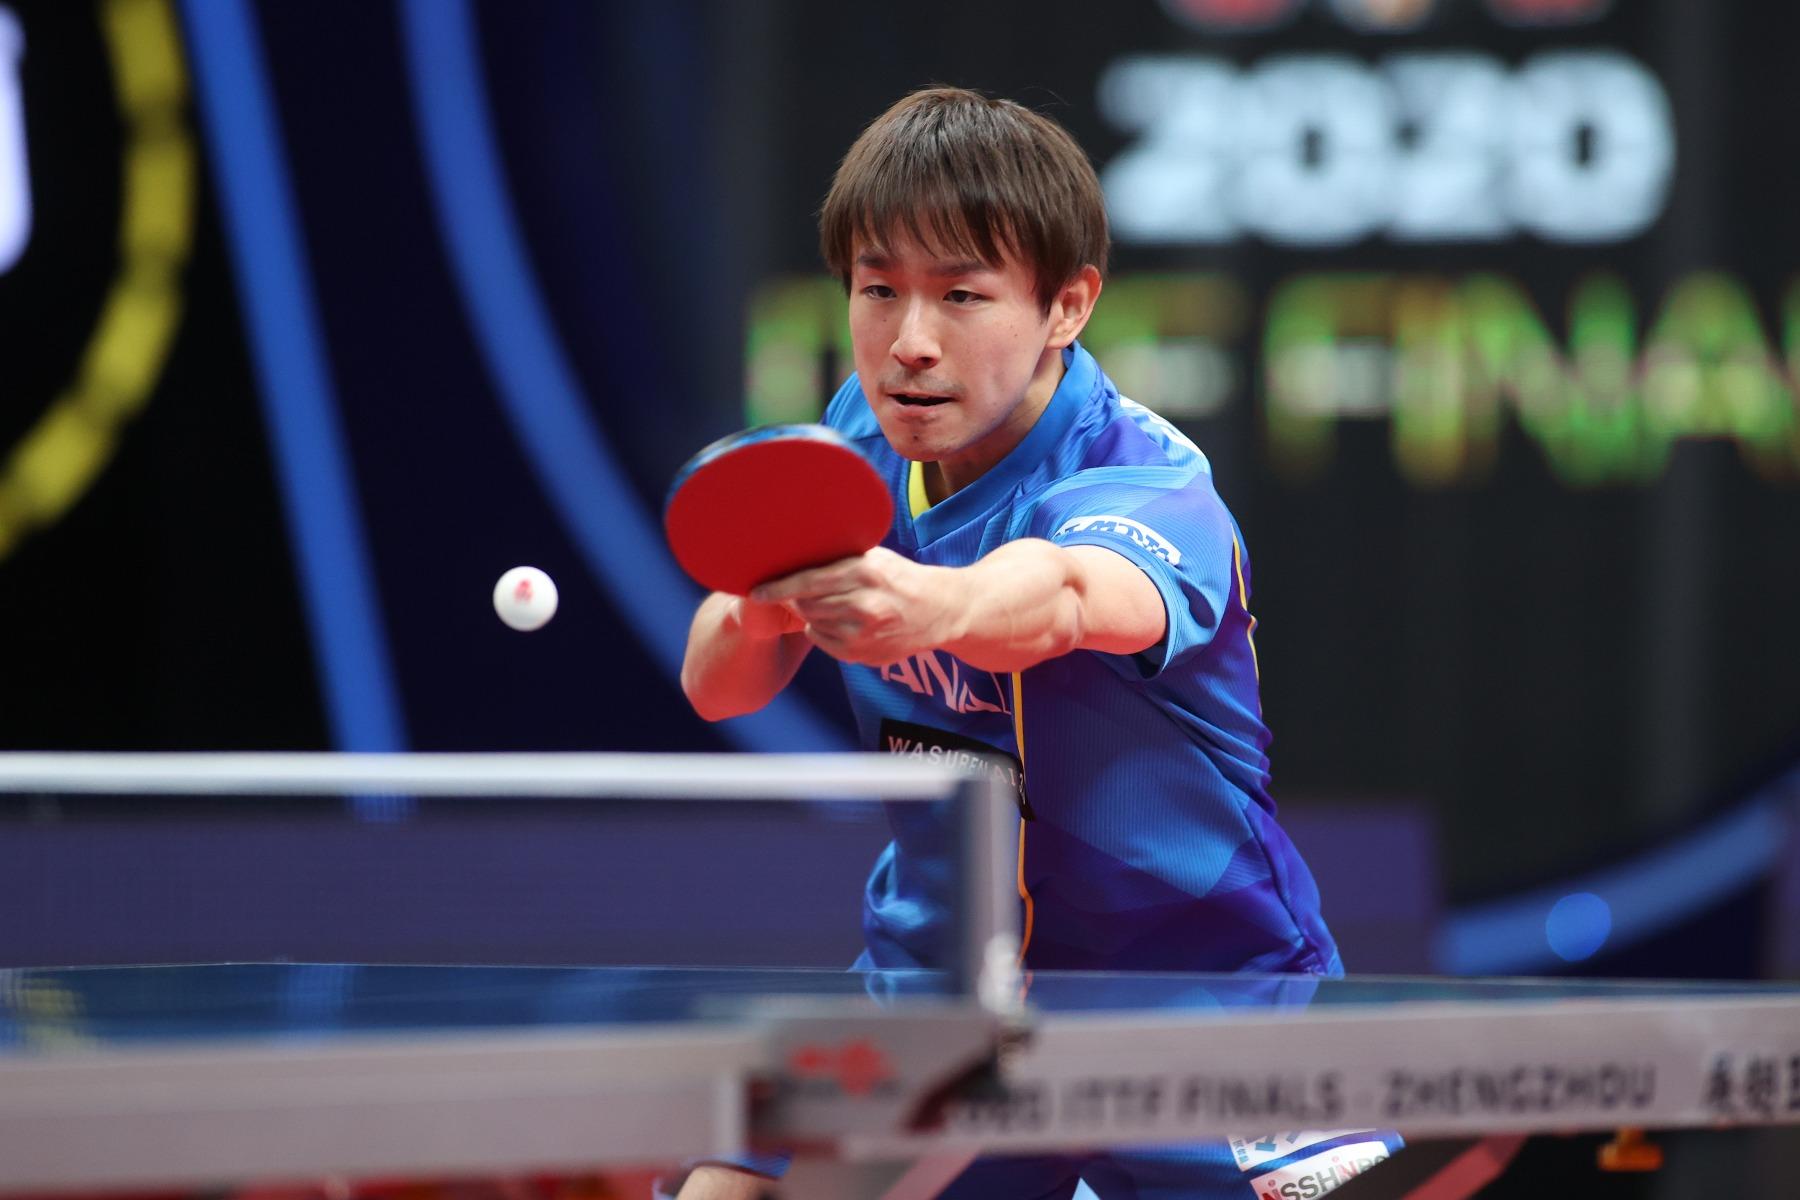 VICTAS VICTAS JOURNAL 卓球 ITTFファイナルズ 男子 丹羽孝希